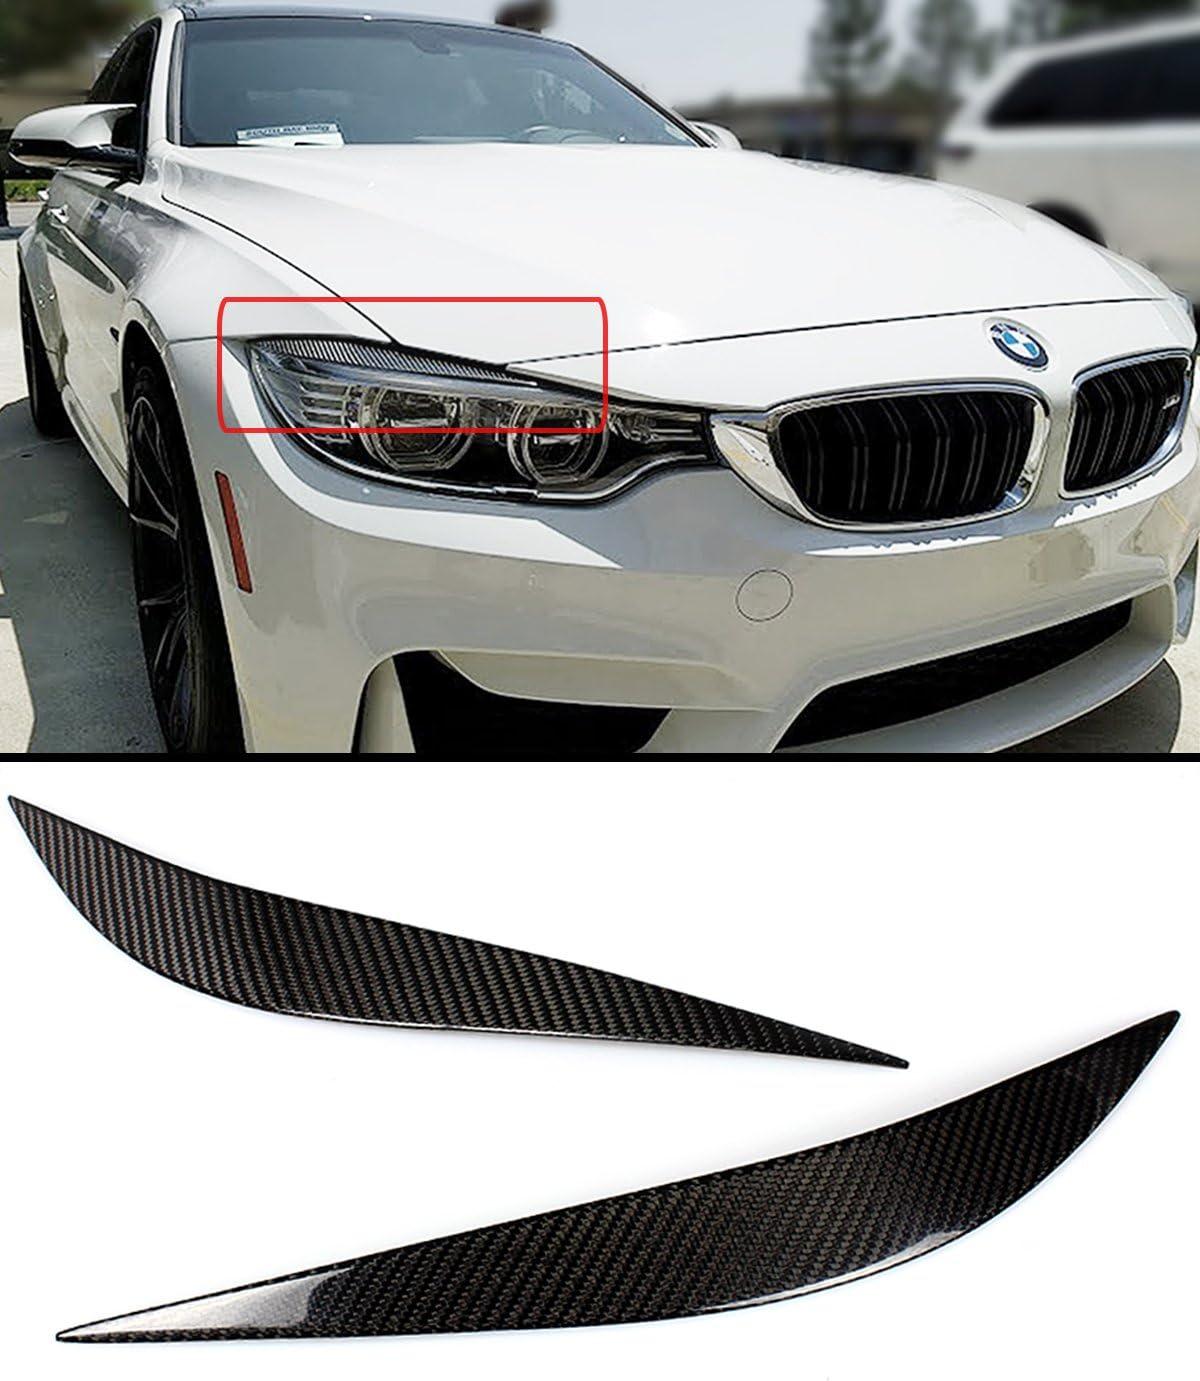 BMW Genuine Emblem Badge Logo Body Panel 3 Series F80 M3 LCI 51148055336